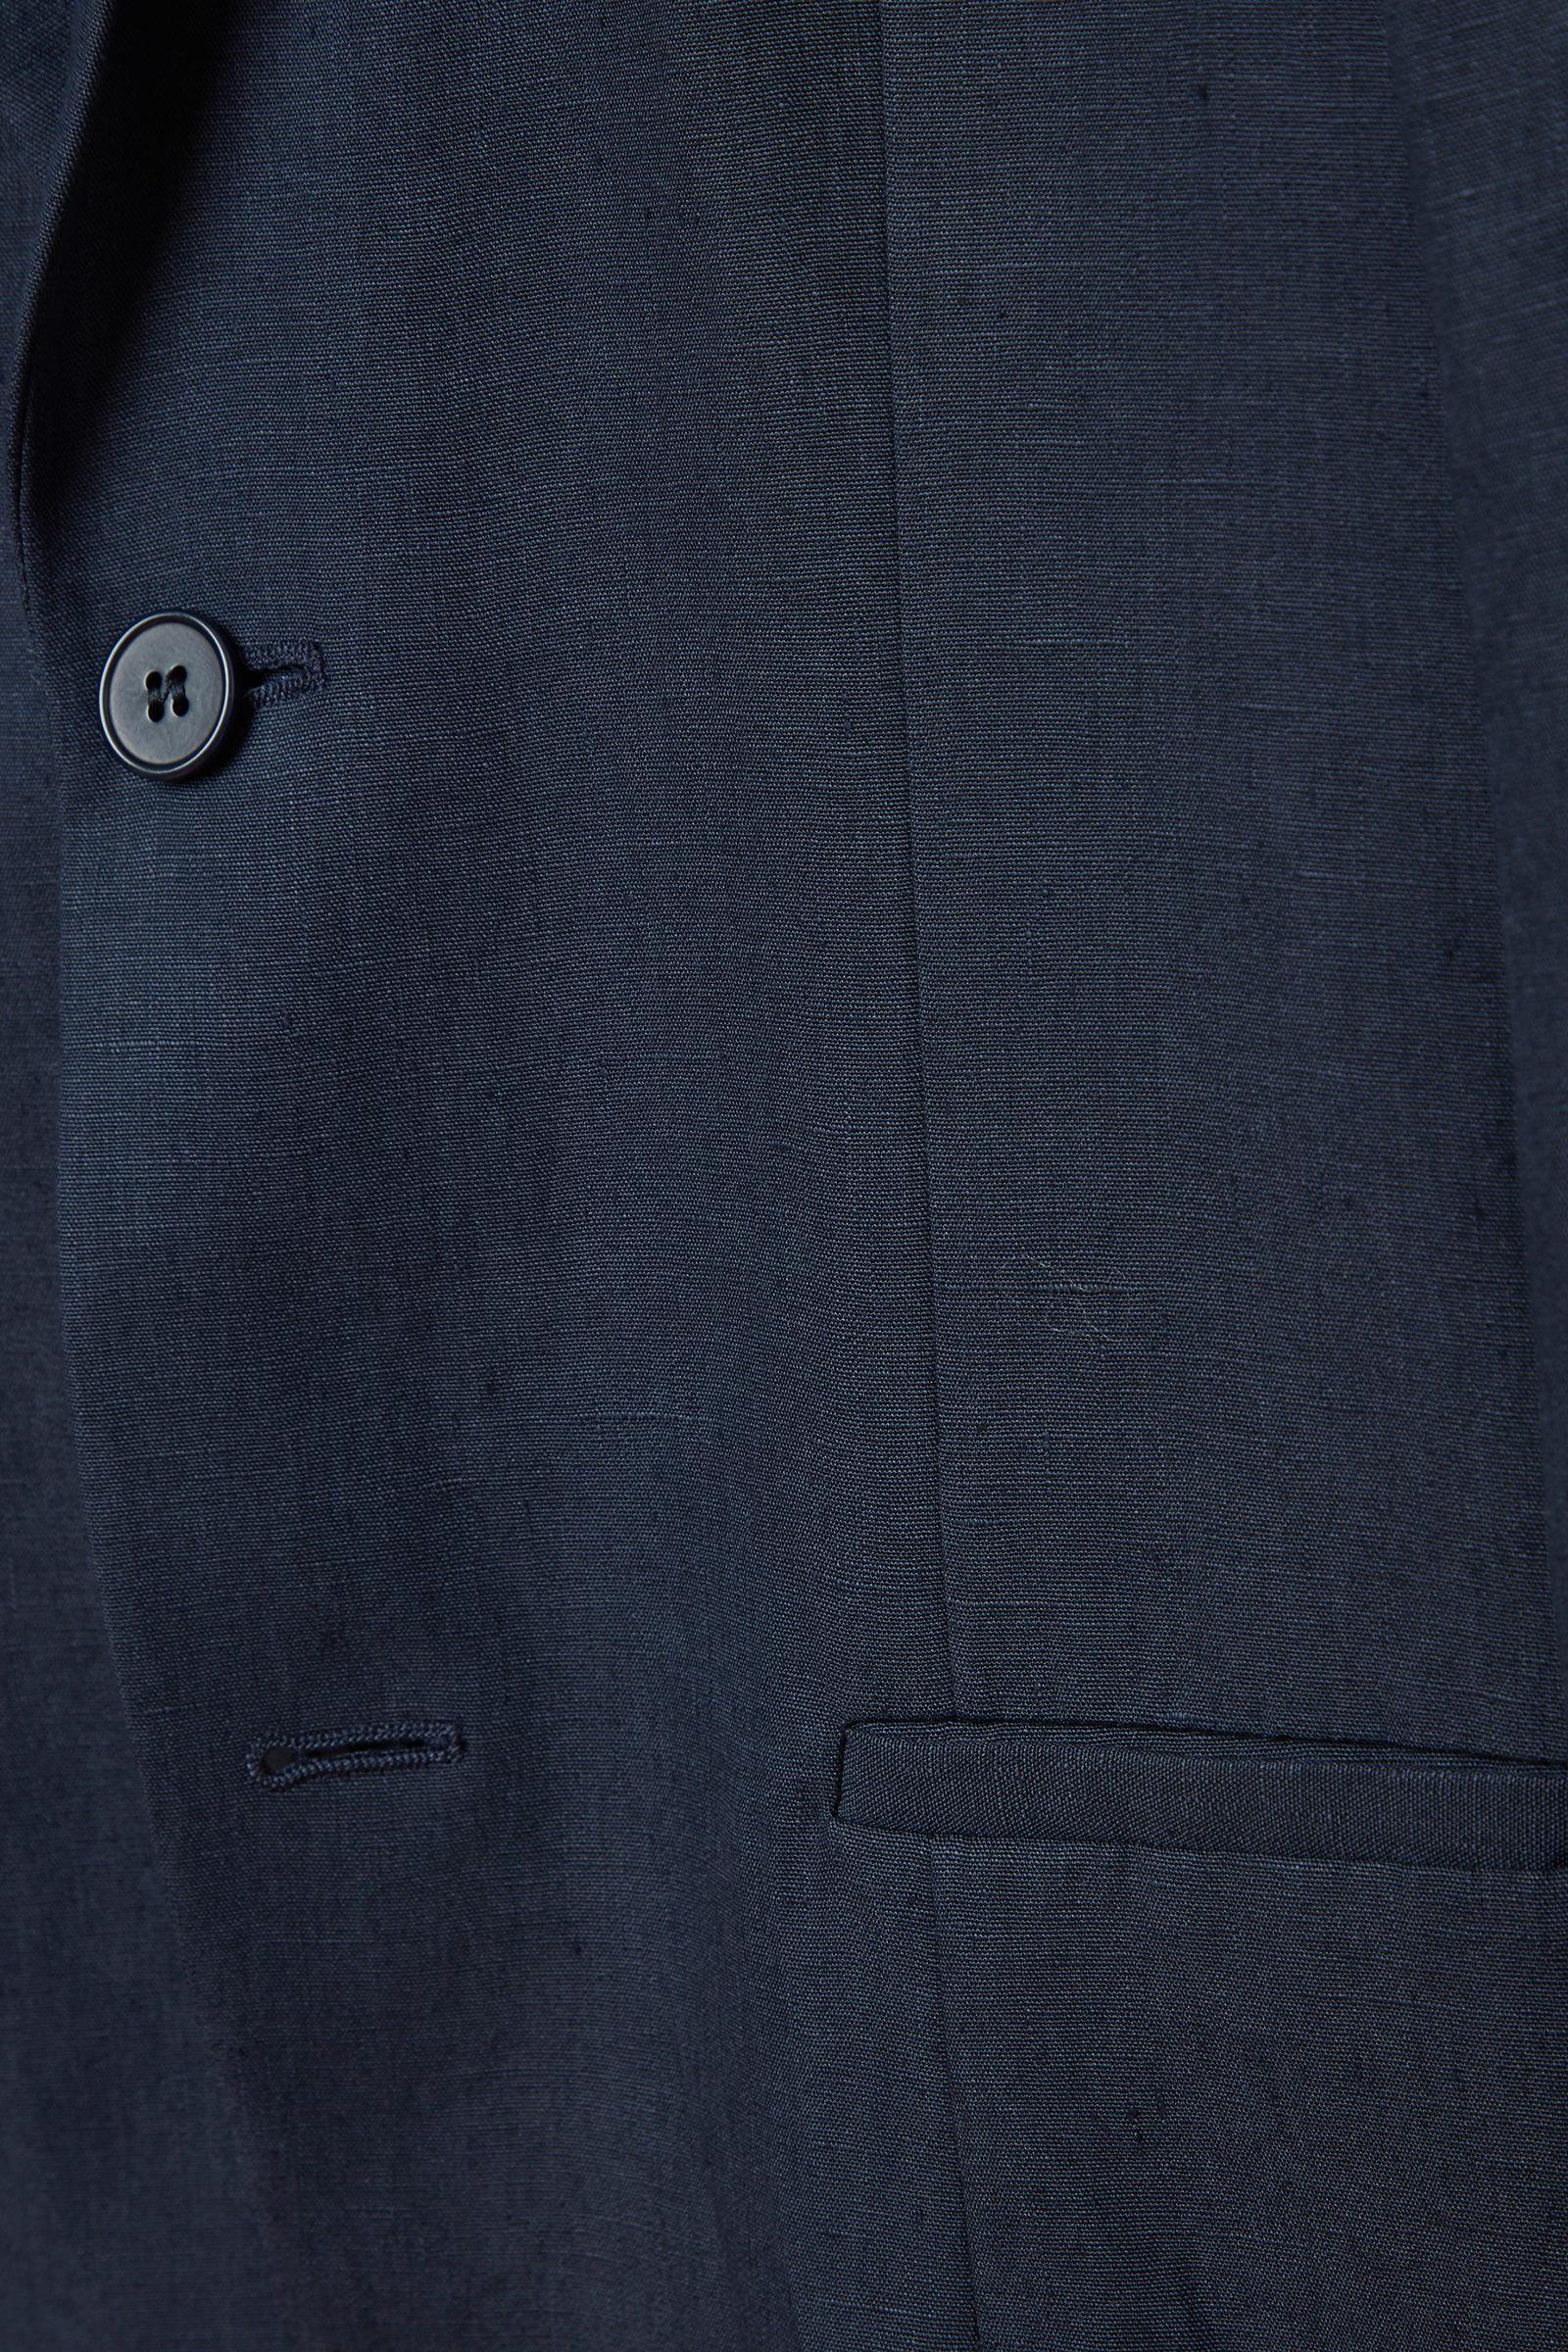 COS 슬림핏 리넨 블레이저의 블루컬러 Detail입니다.